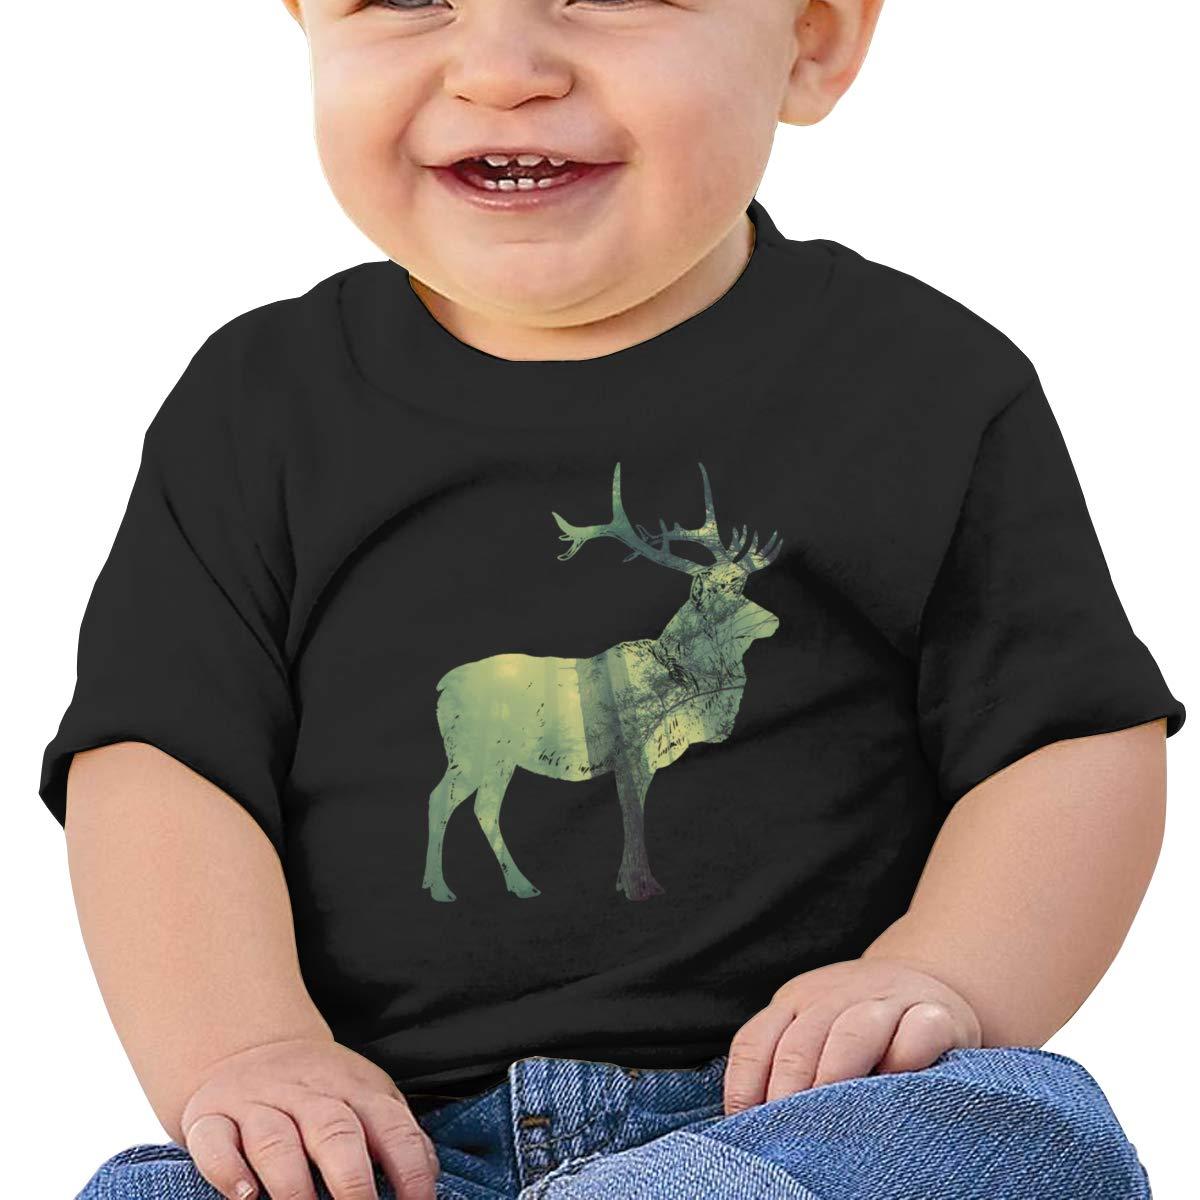 Qiop Nee Forest Mist Deer Short Sleeve Tee Baby Girls